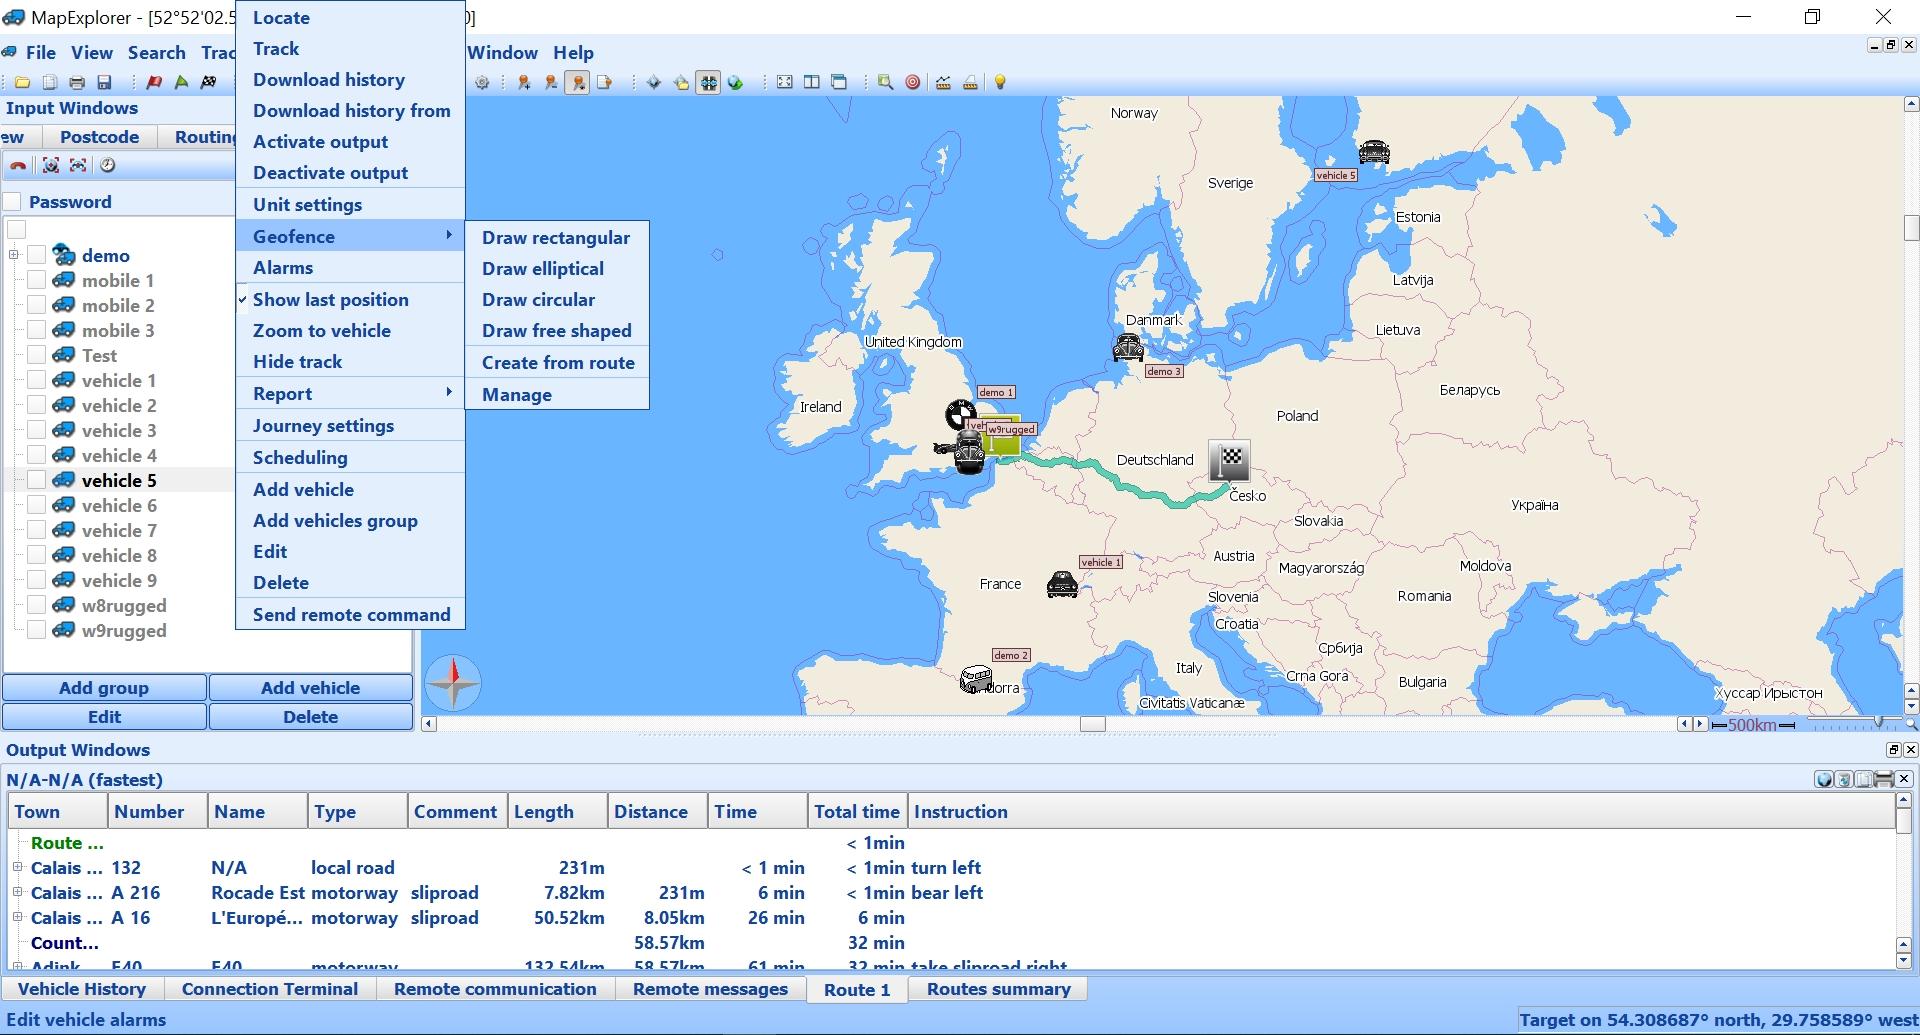 MapExplorer - screenshot 1